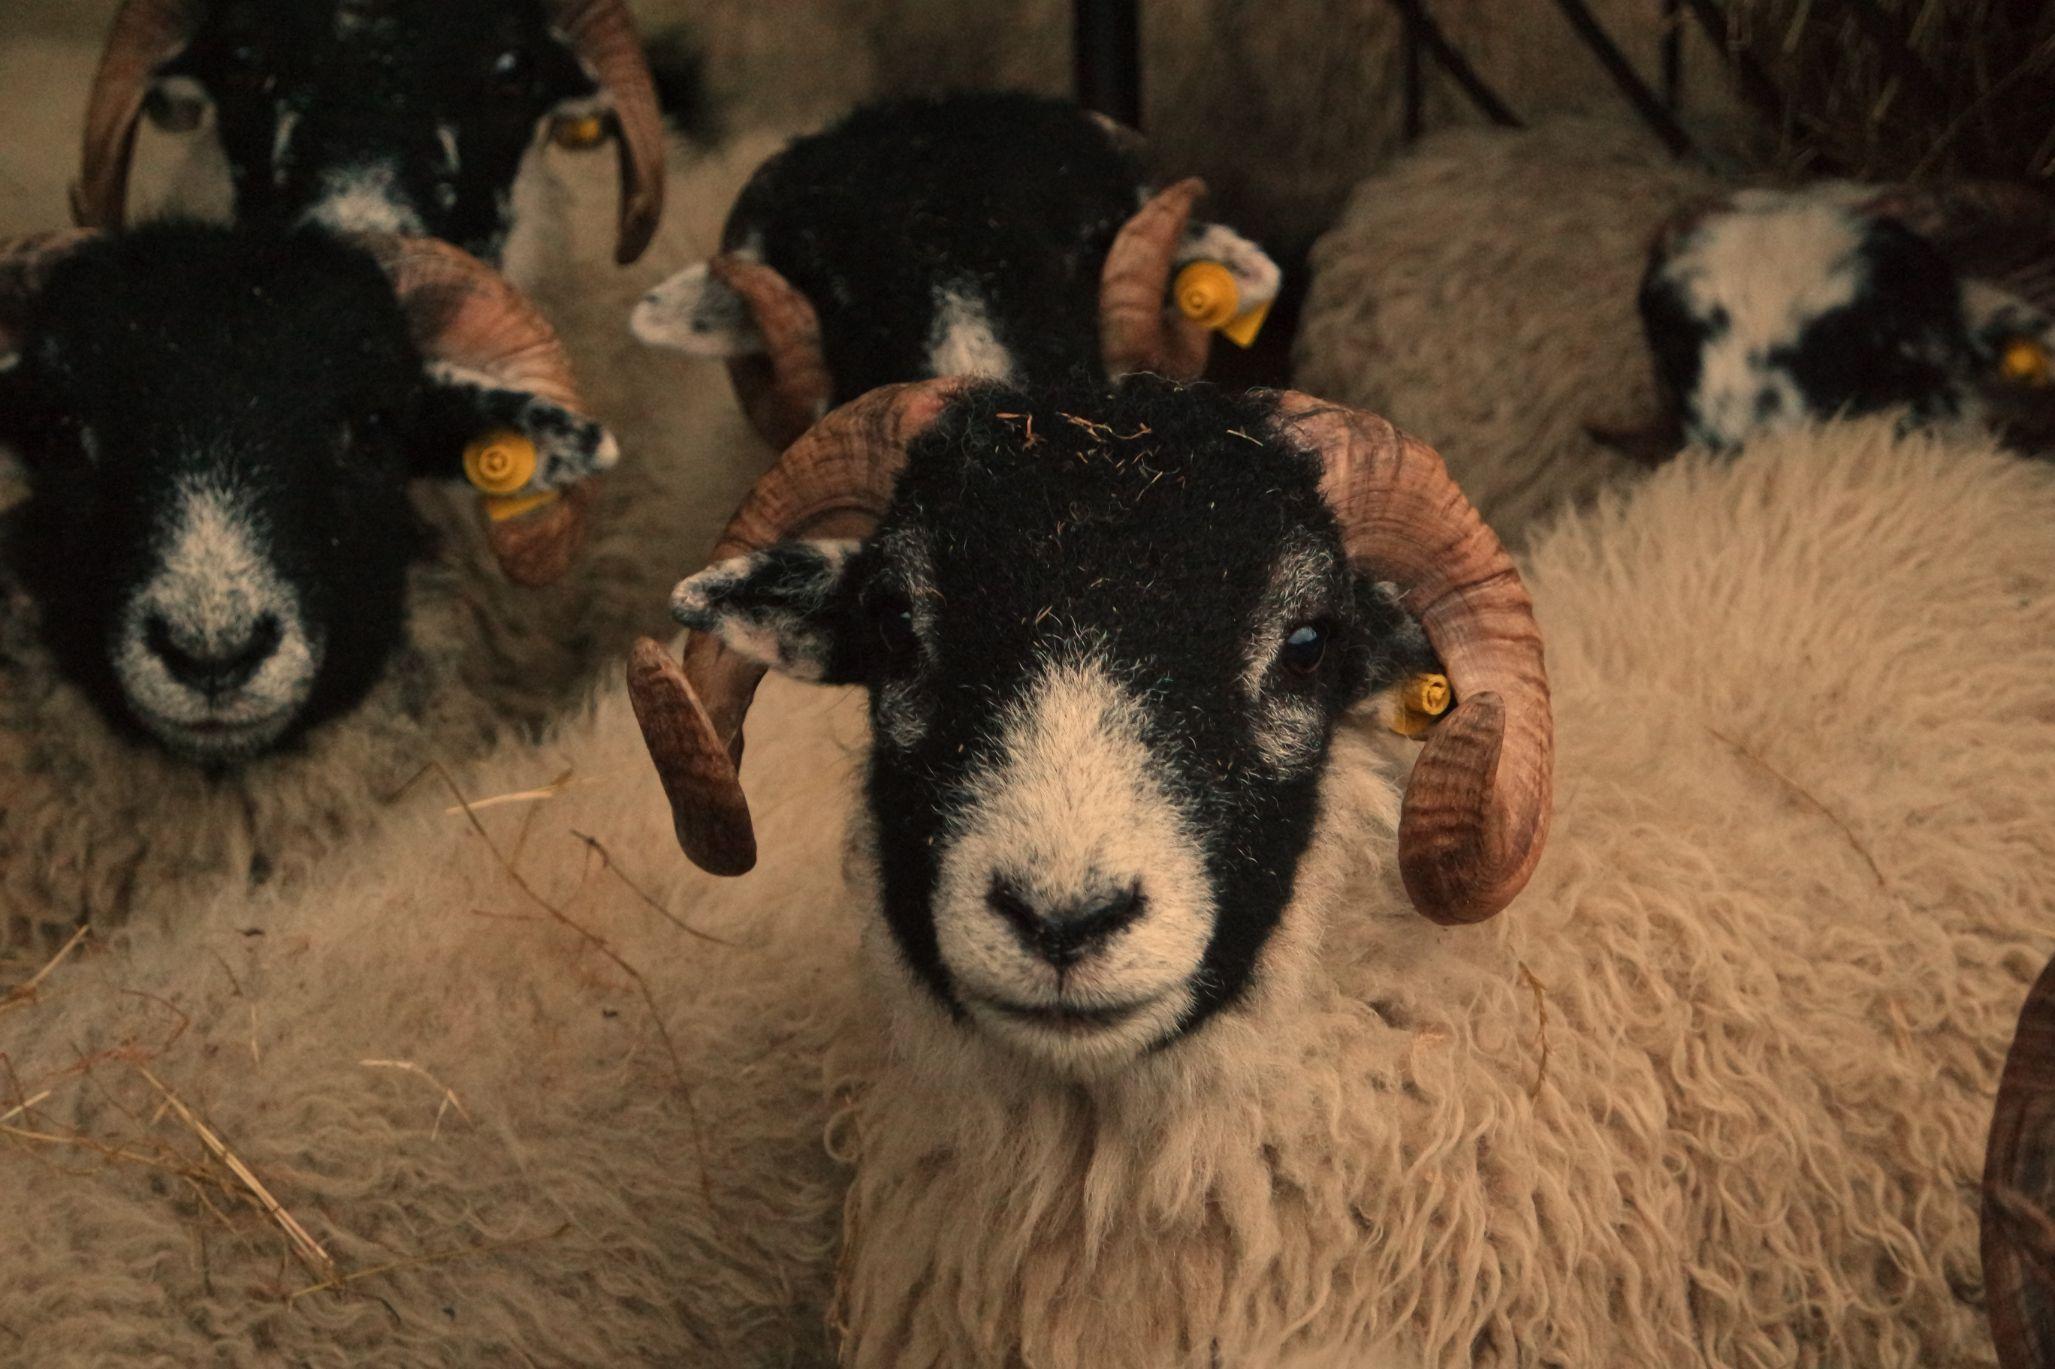 sheep, sheep farming, sheep farmers, sheep prices, lamb prices